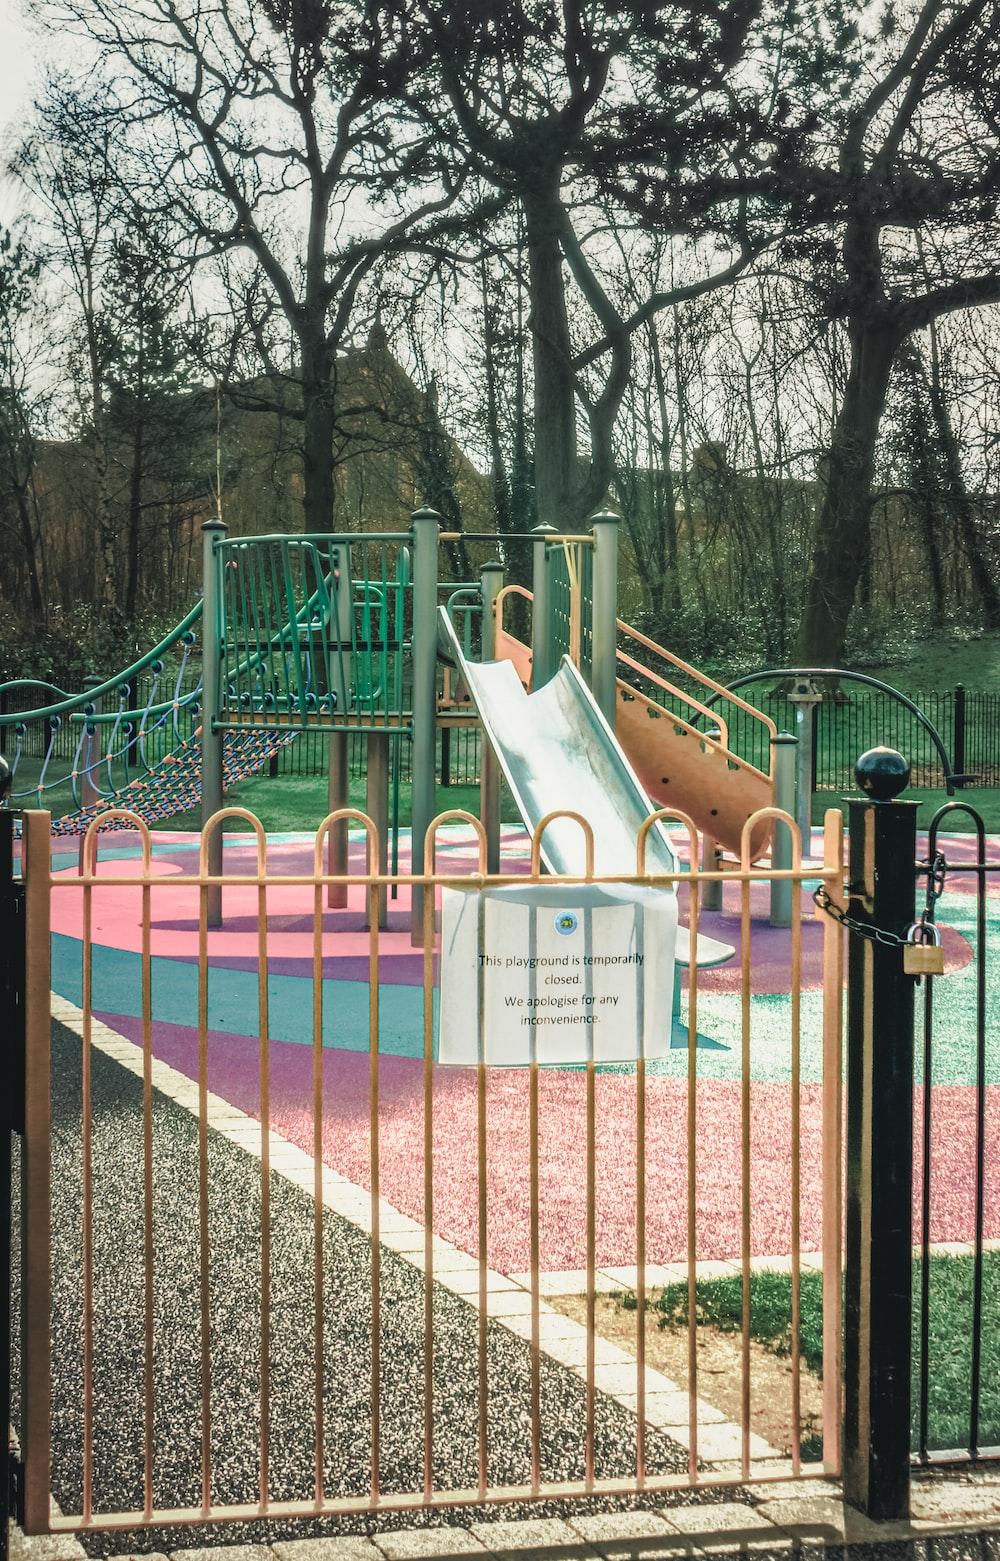 pink and white playground during daytime